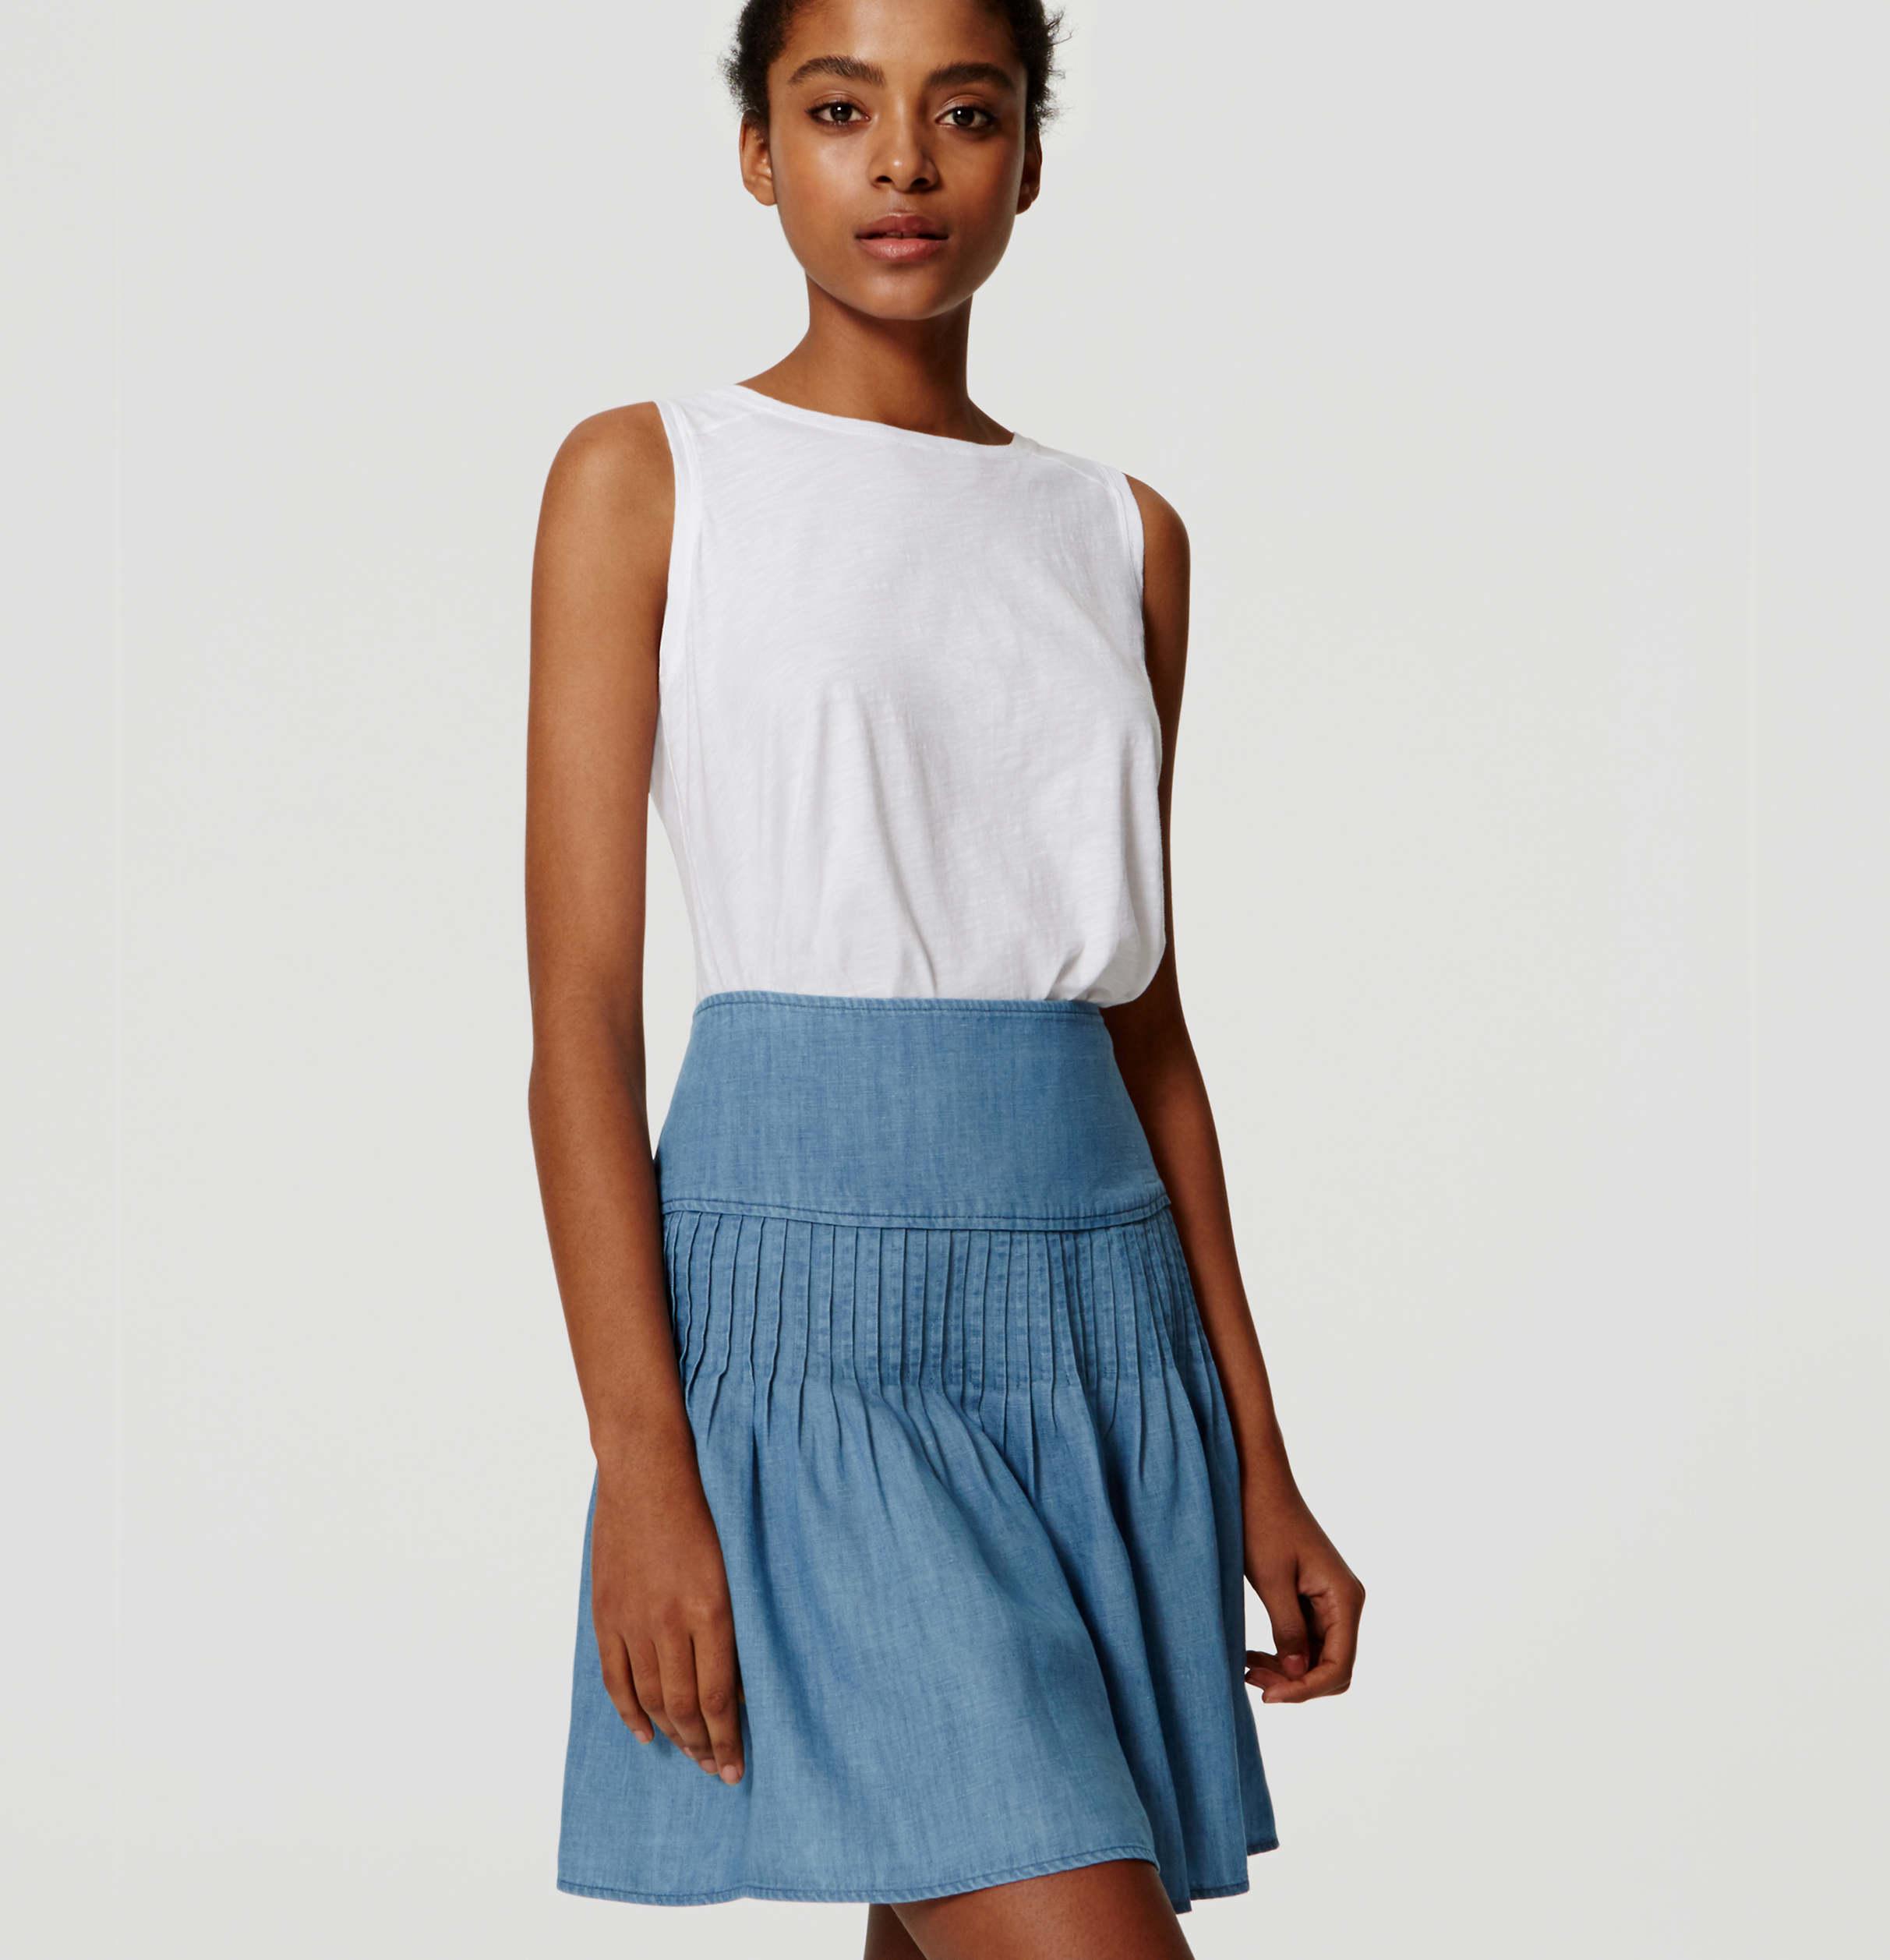 435a513137c61e LOFT Chambray Flippy Skirt in Blue - Lyst